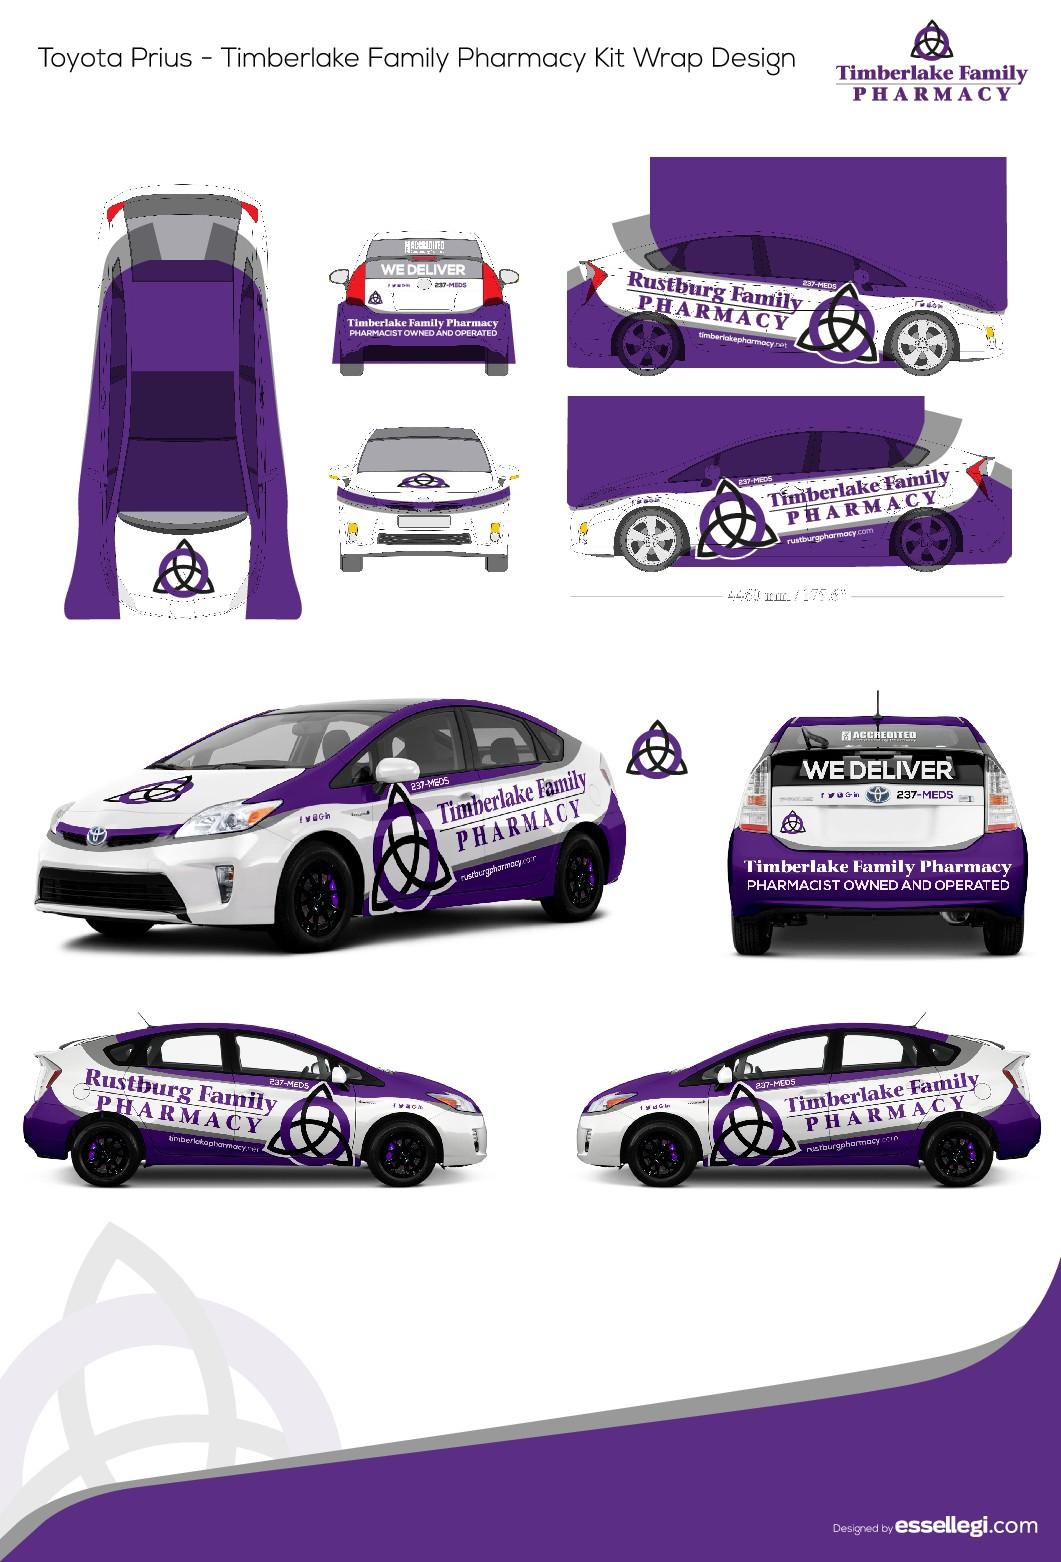 Design a car wrap for new retro pharmacy, Timberlake Family Pharmacy